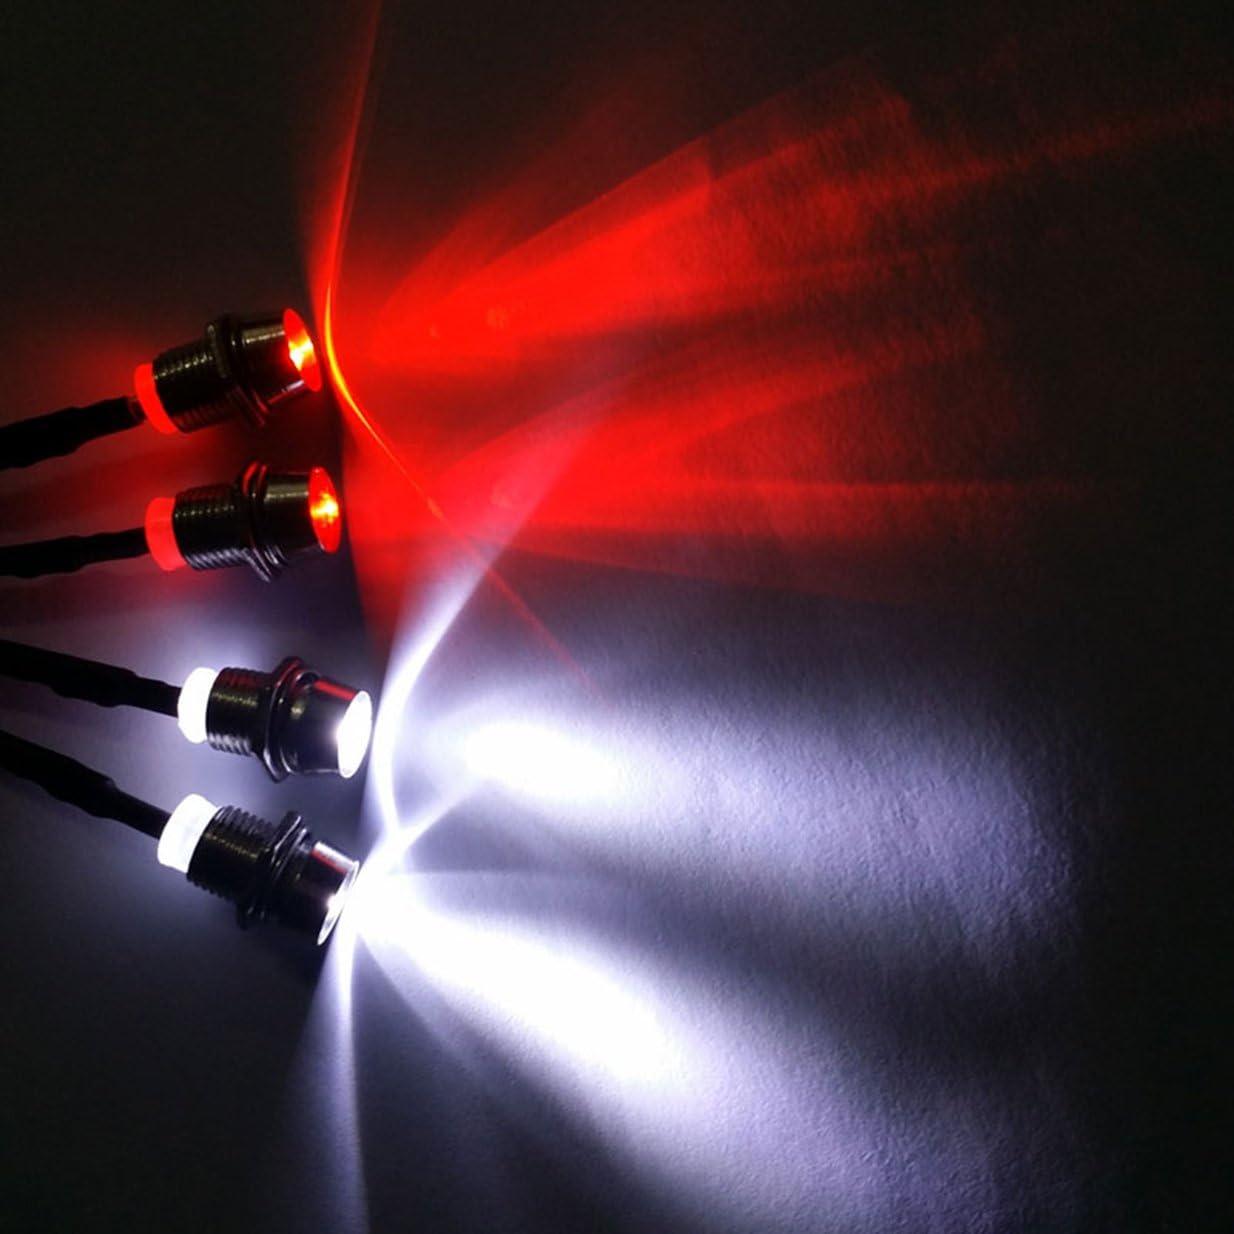 ShareGoo 4LED Light Headlights Compati Accessories Kit cheap Taillight Recommendation